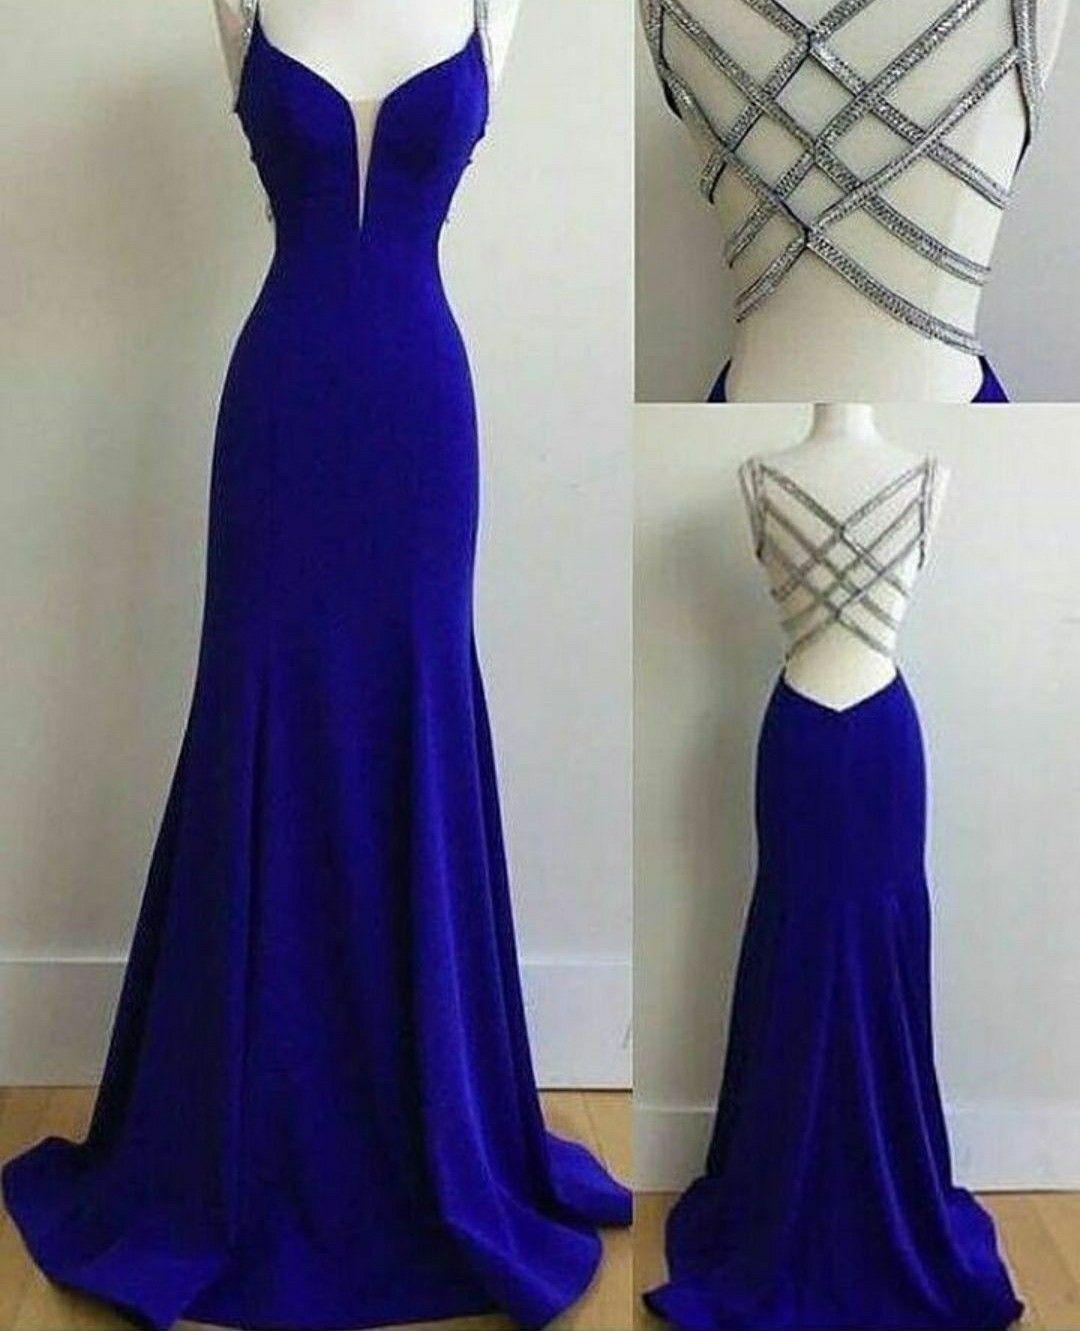 Pin de Audrey en Dresses | Pinterest | Vestiditos, Vestidos de ...